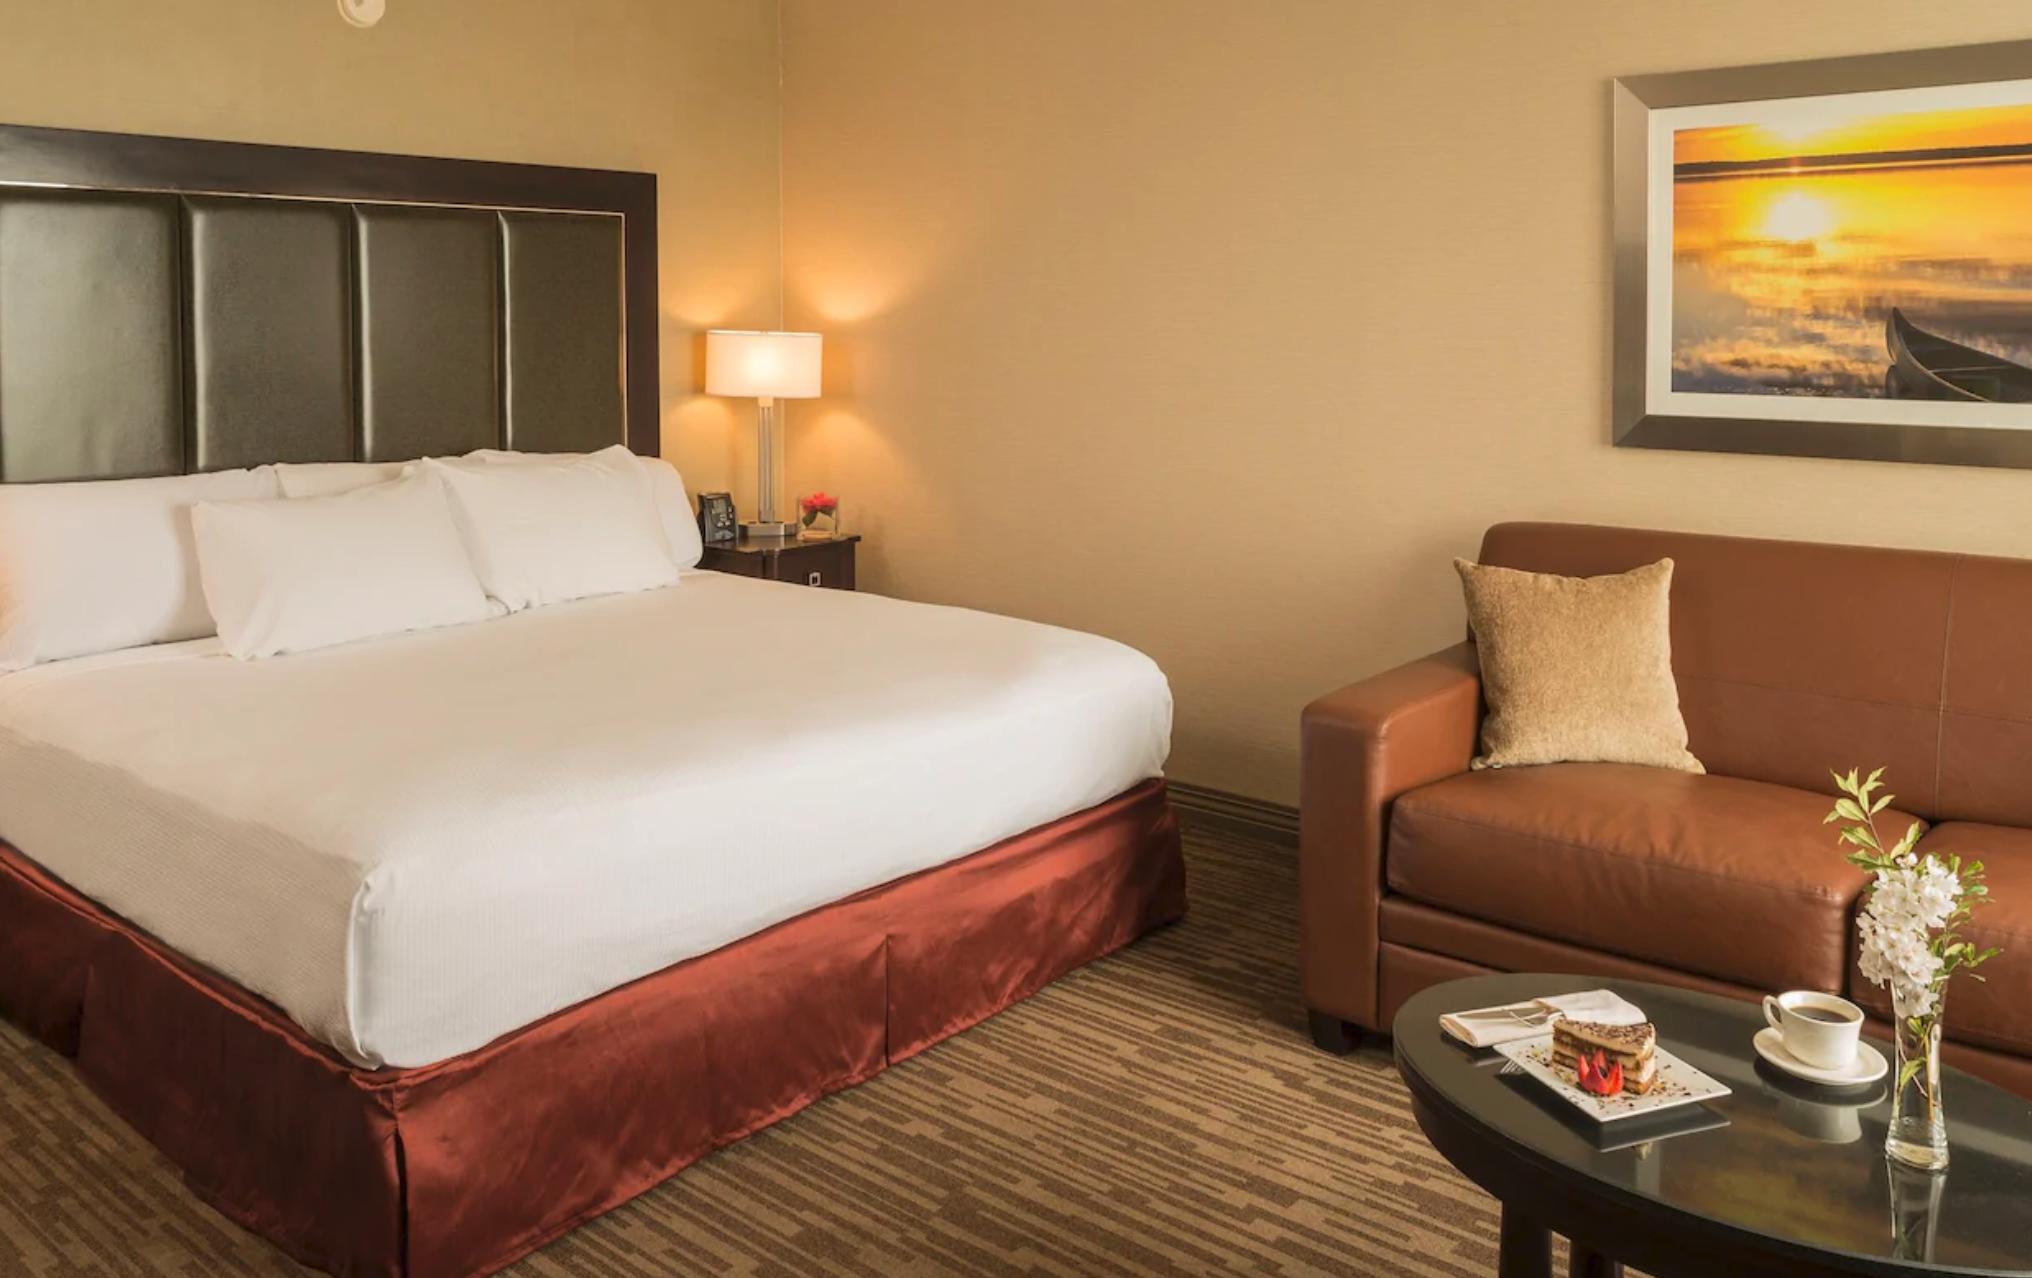 https://www.hotelsbyday.com/_data/default-hotel_image/4/20413/screenshot-2020-08-13-at-9-57-50-am.png